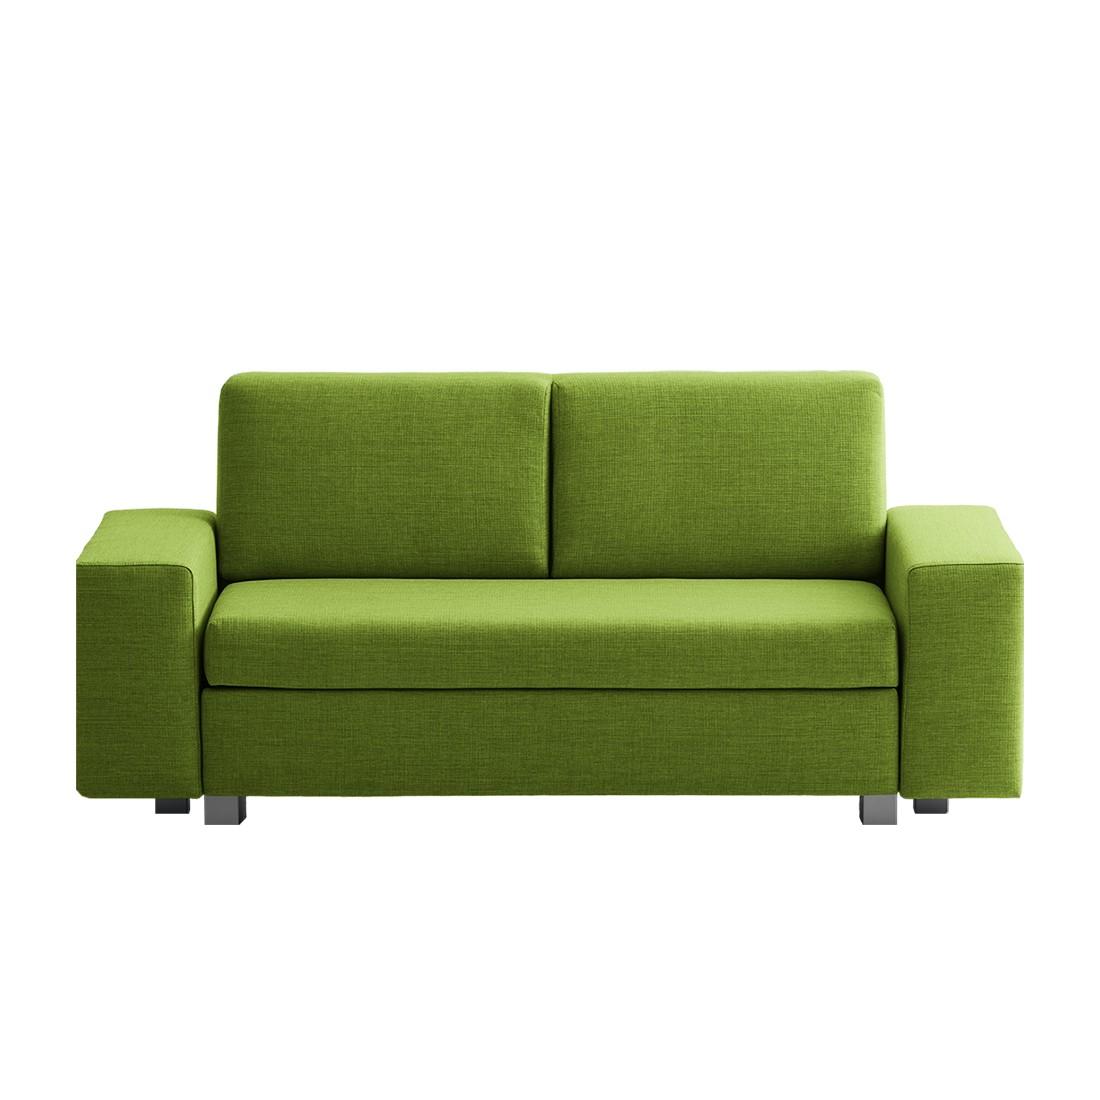 goedkoop Slaapbank Plaza geweven stof Groen 178cm Brede armleuning chillout by Franz Fertig